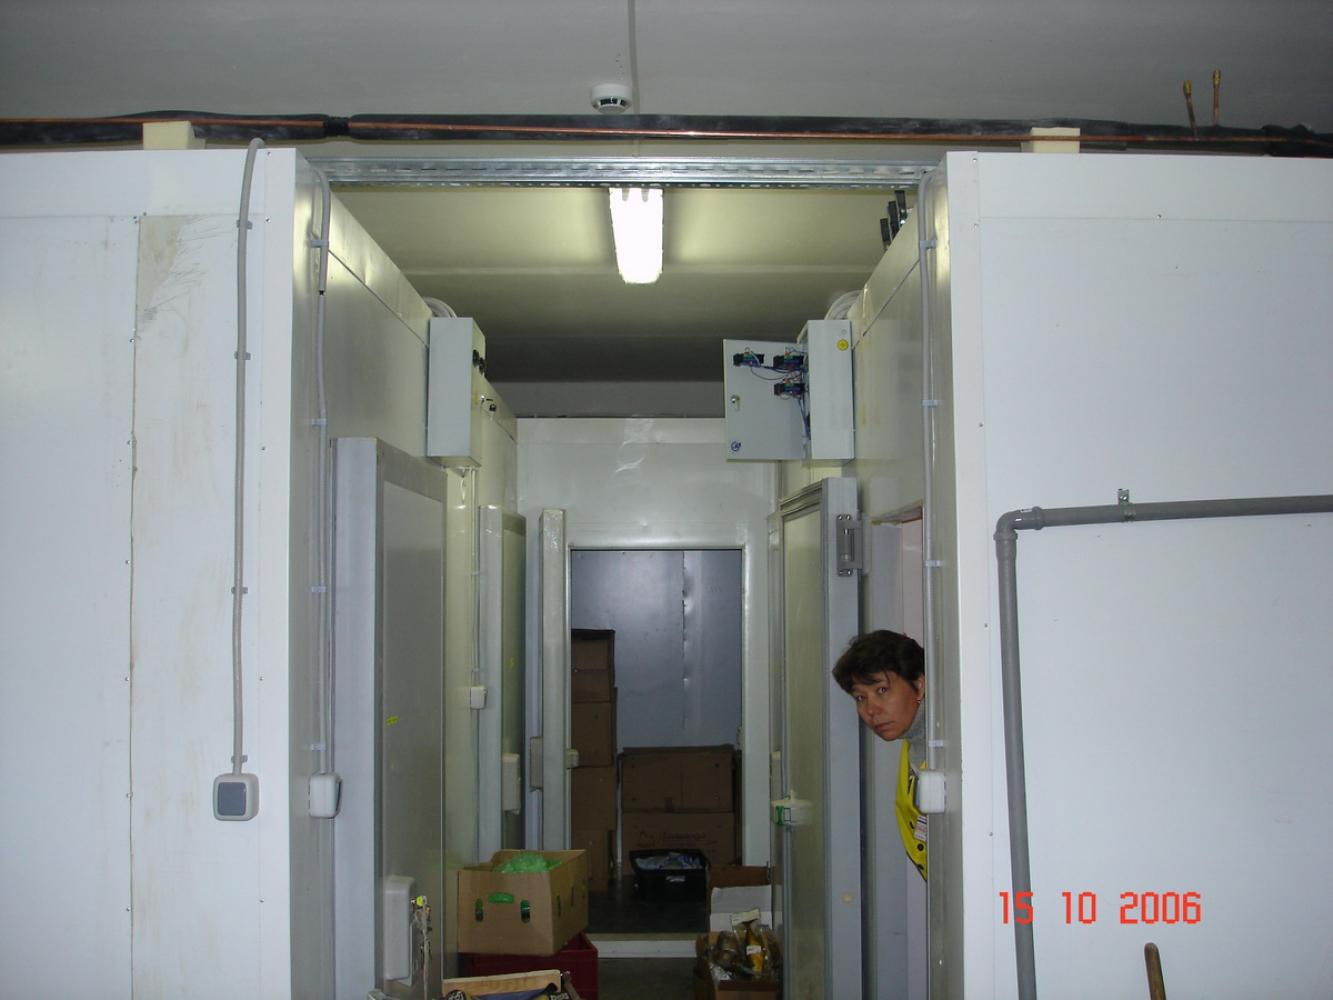 Ремонт холодильника своими руками - Доктор холод 22